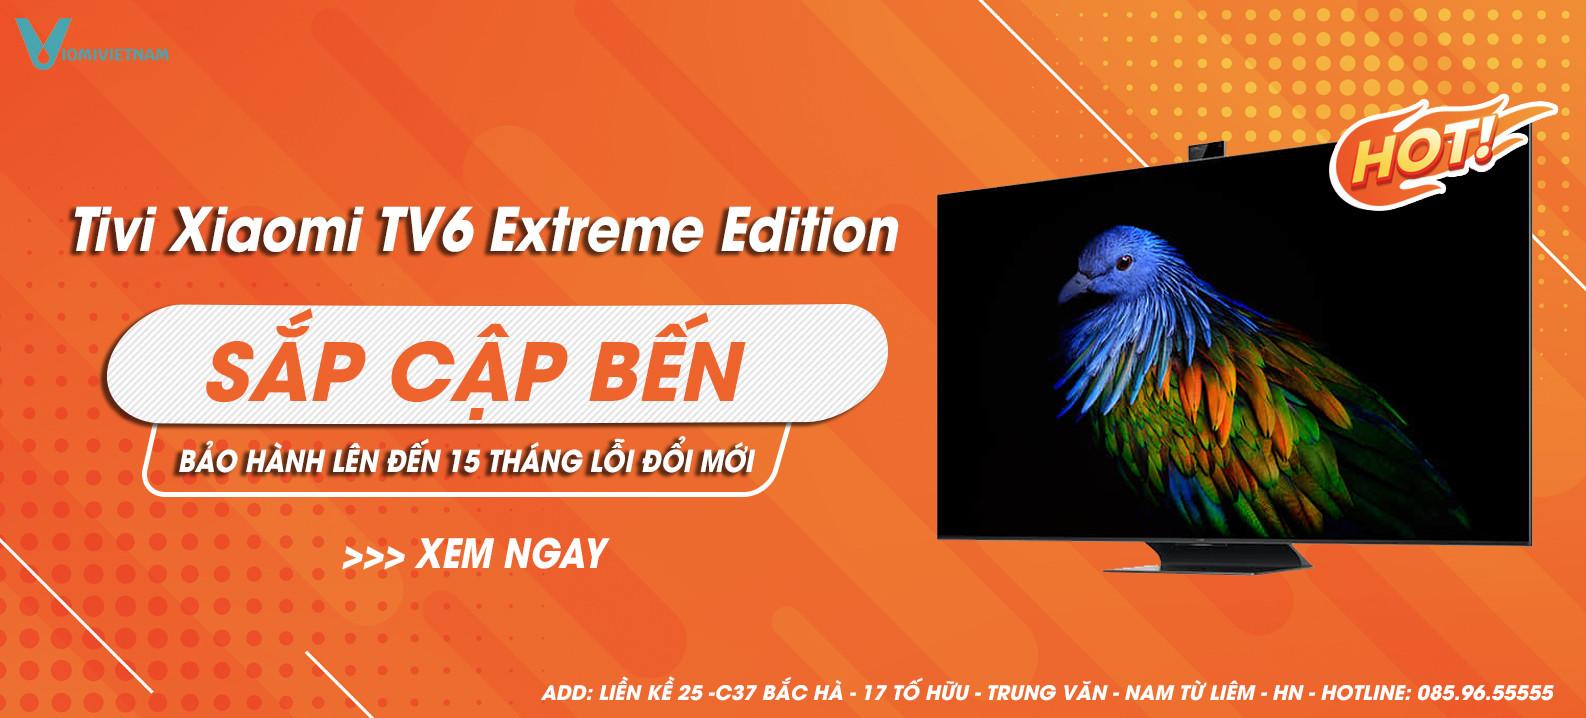 Tivi Xiaomi TV6 Extreme Edition